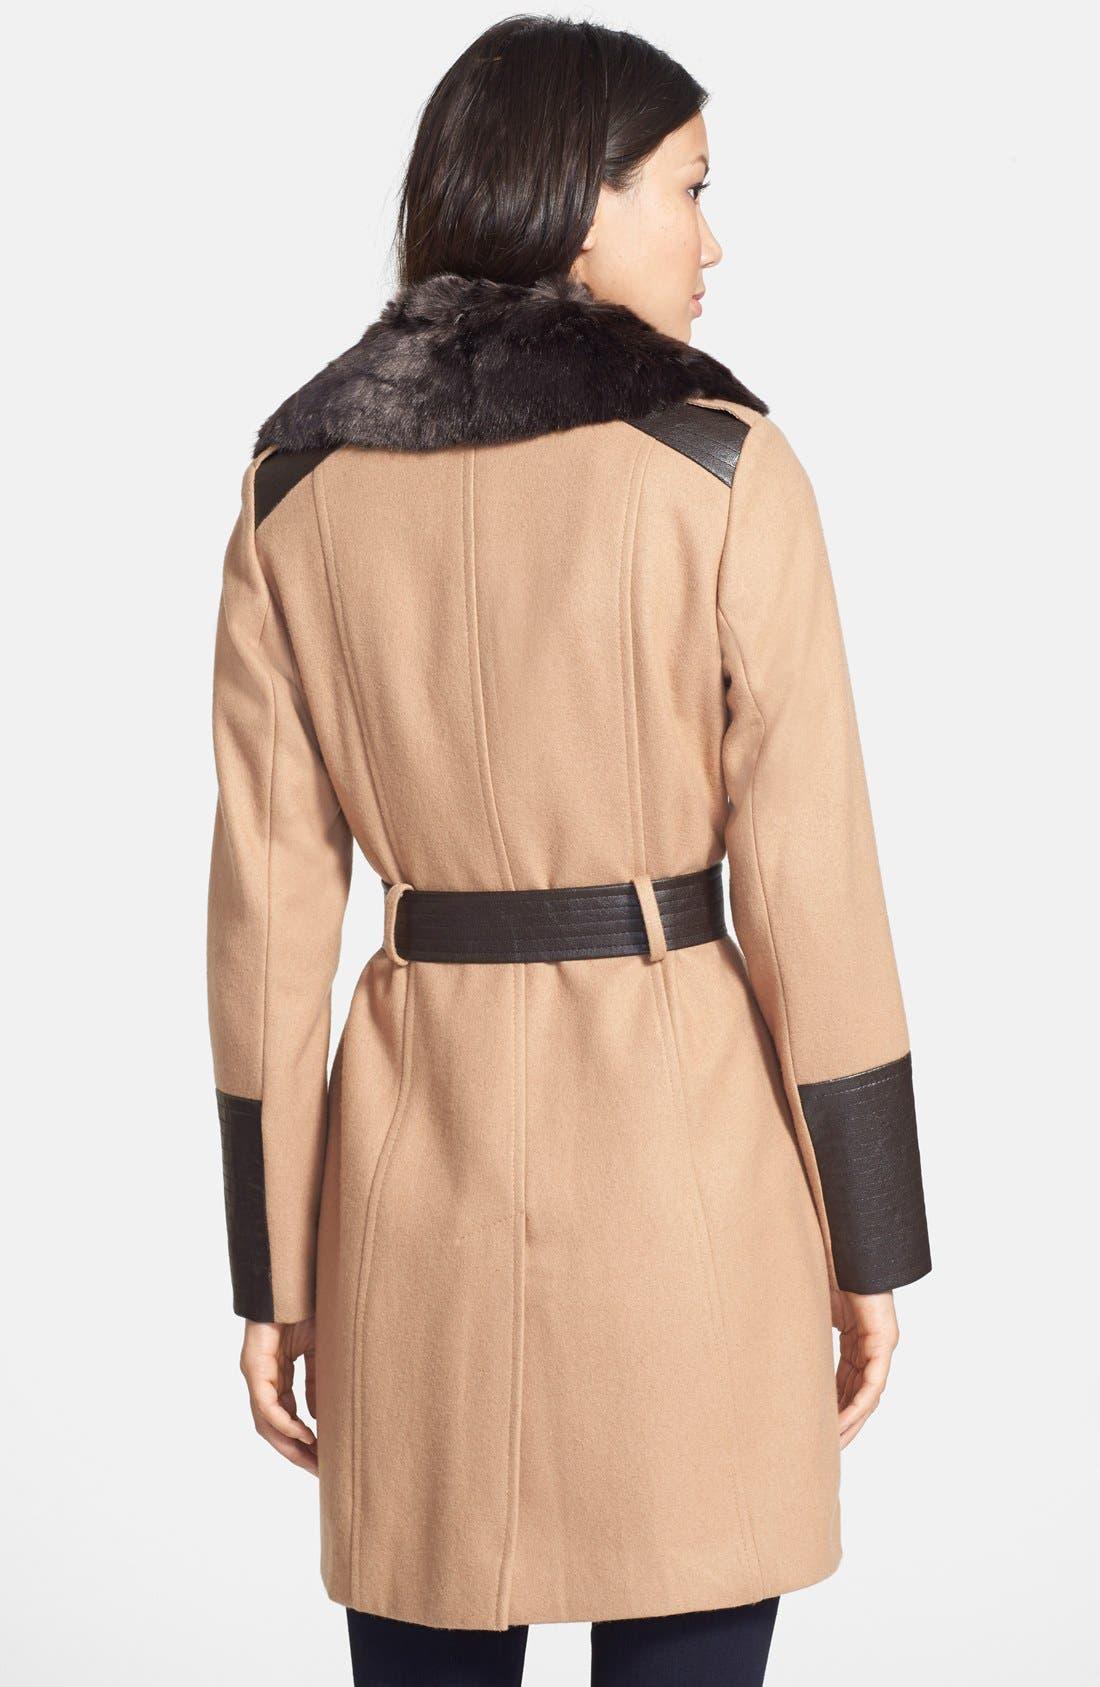 Alternate Image 2  - Via Spiga Faux Fur & Faux Leather Trim Asymmetrical Belted Coat (Online Only)